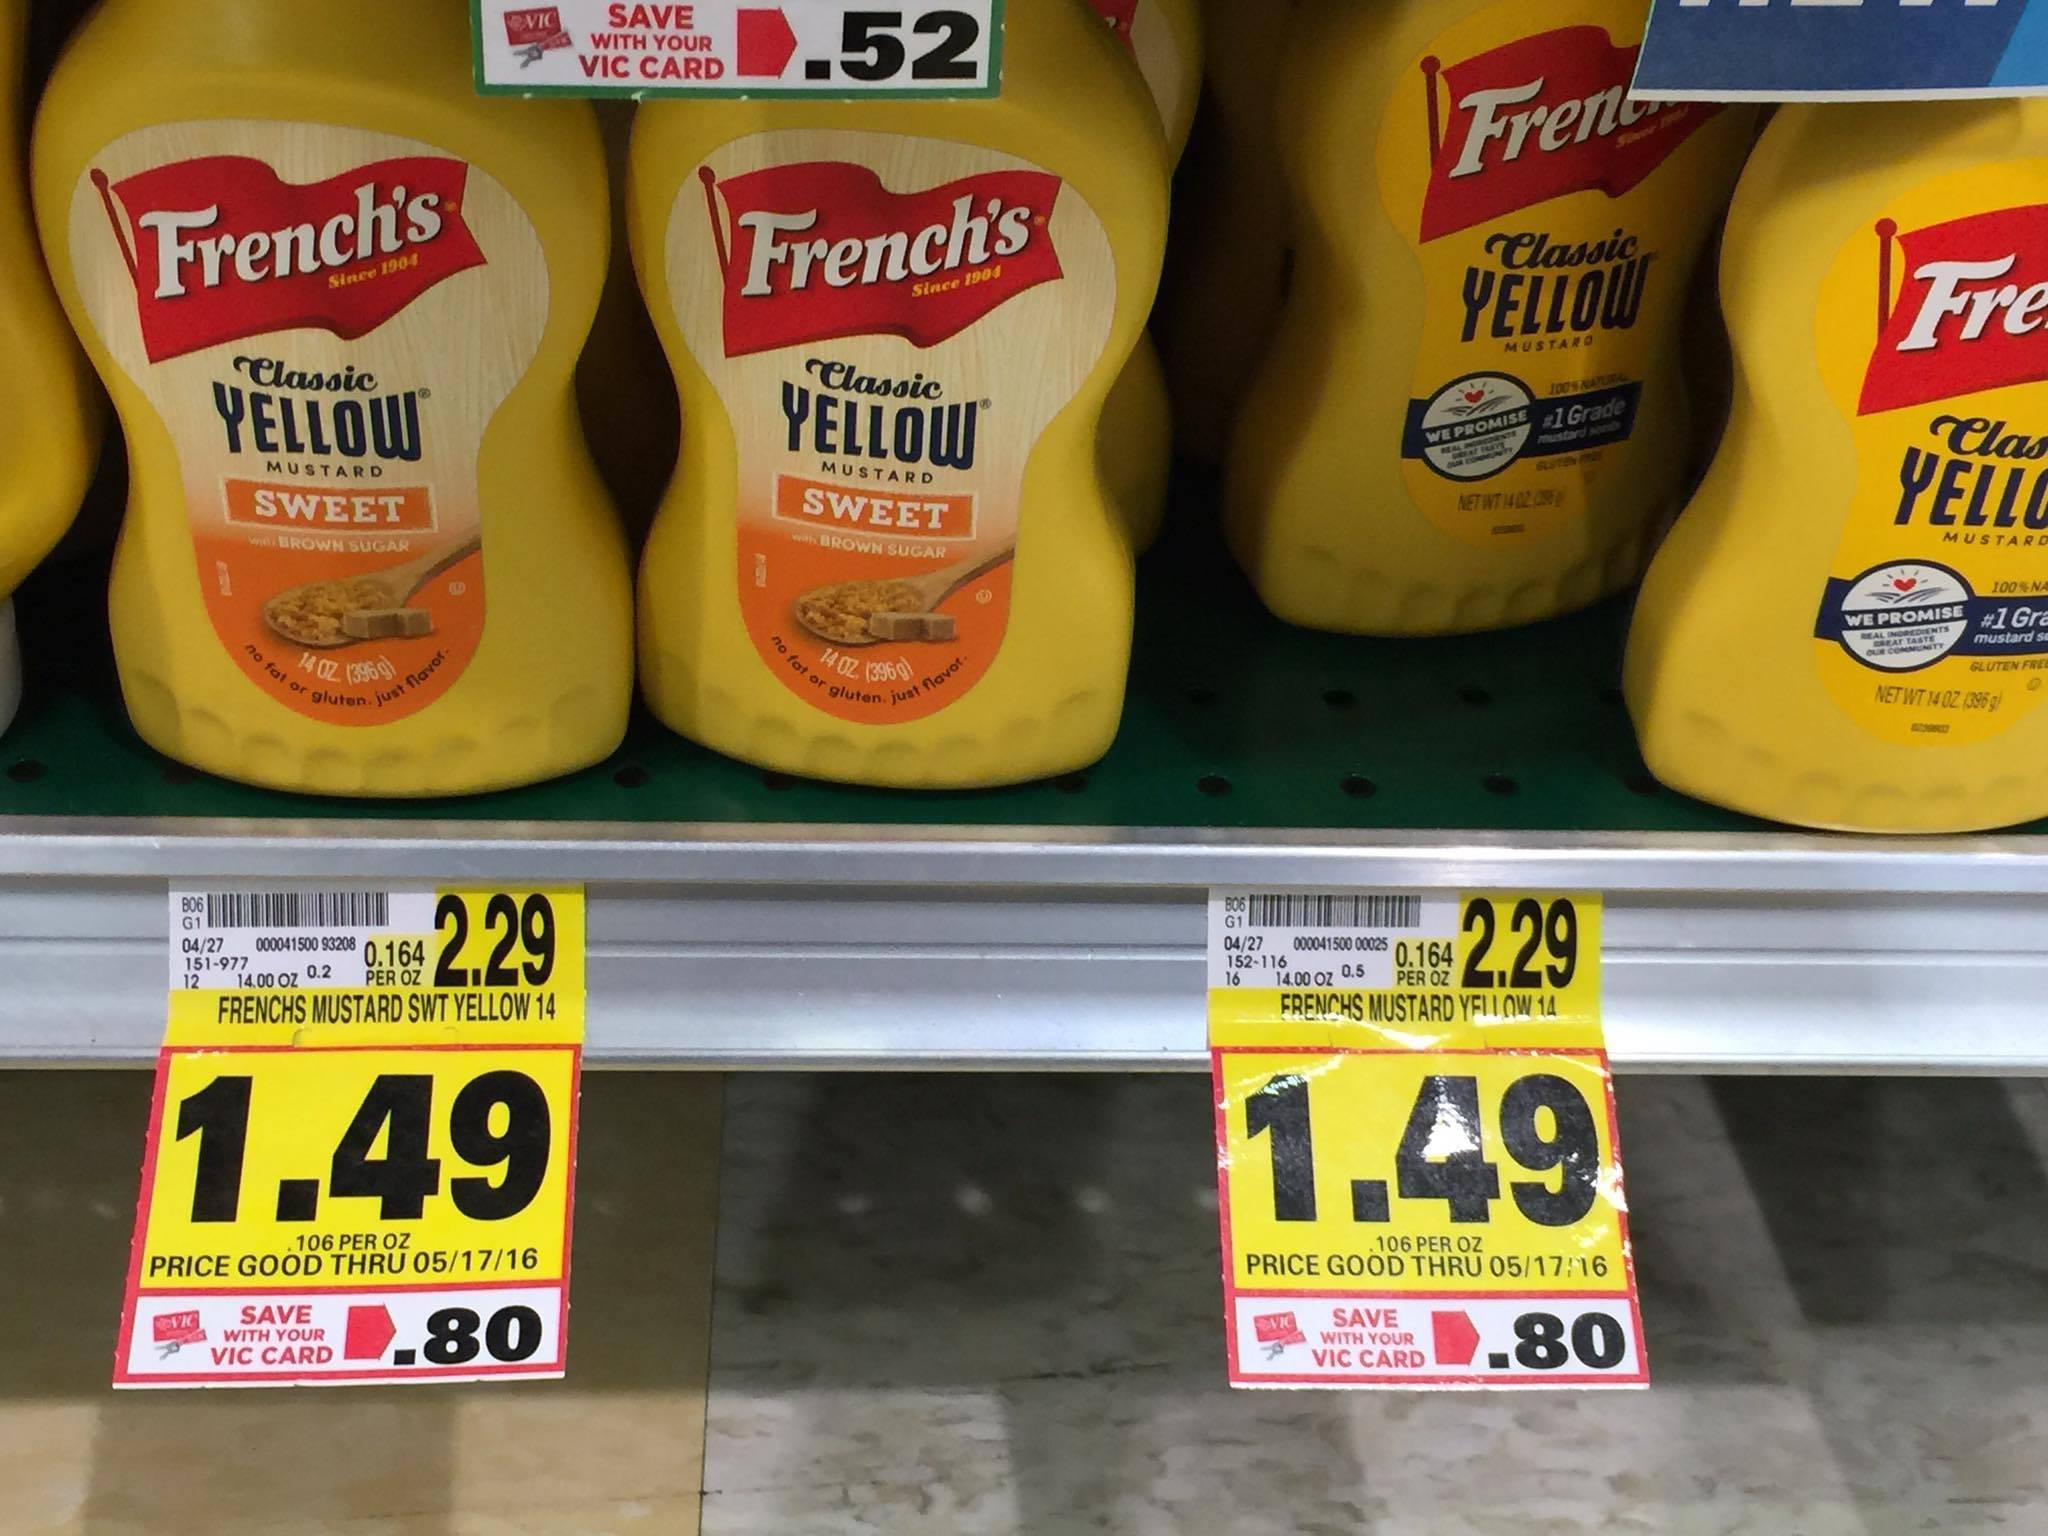 French's Mustard